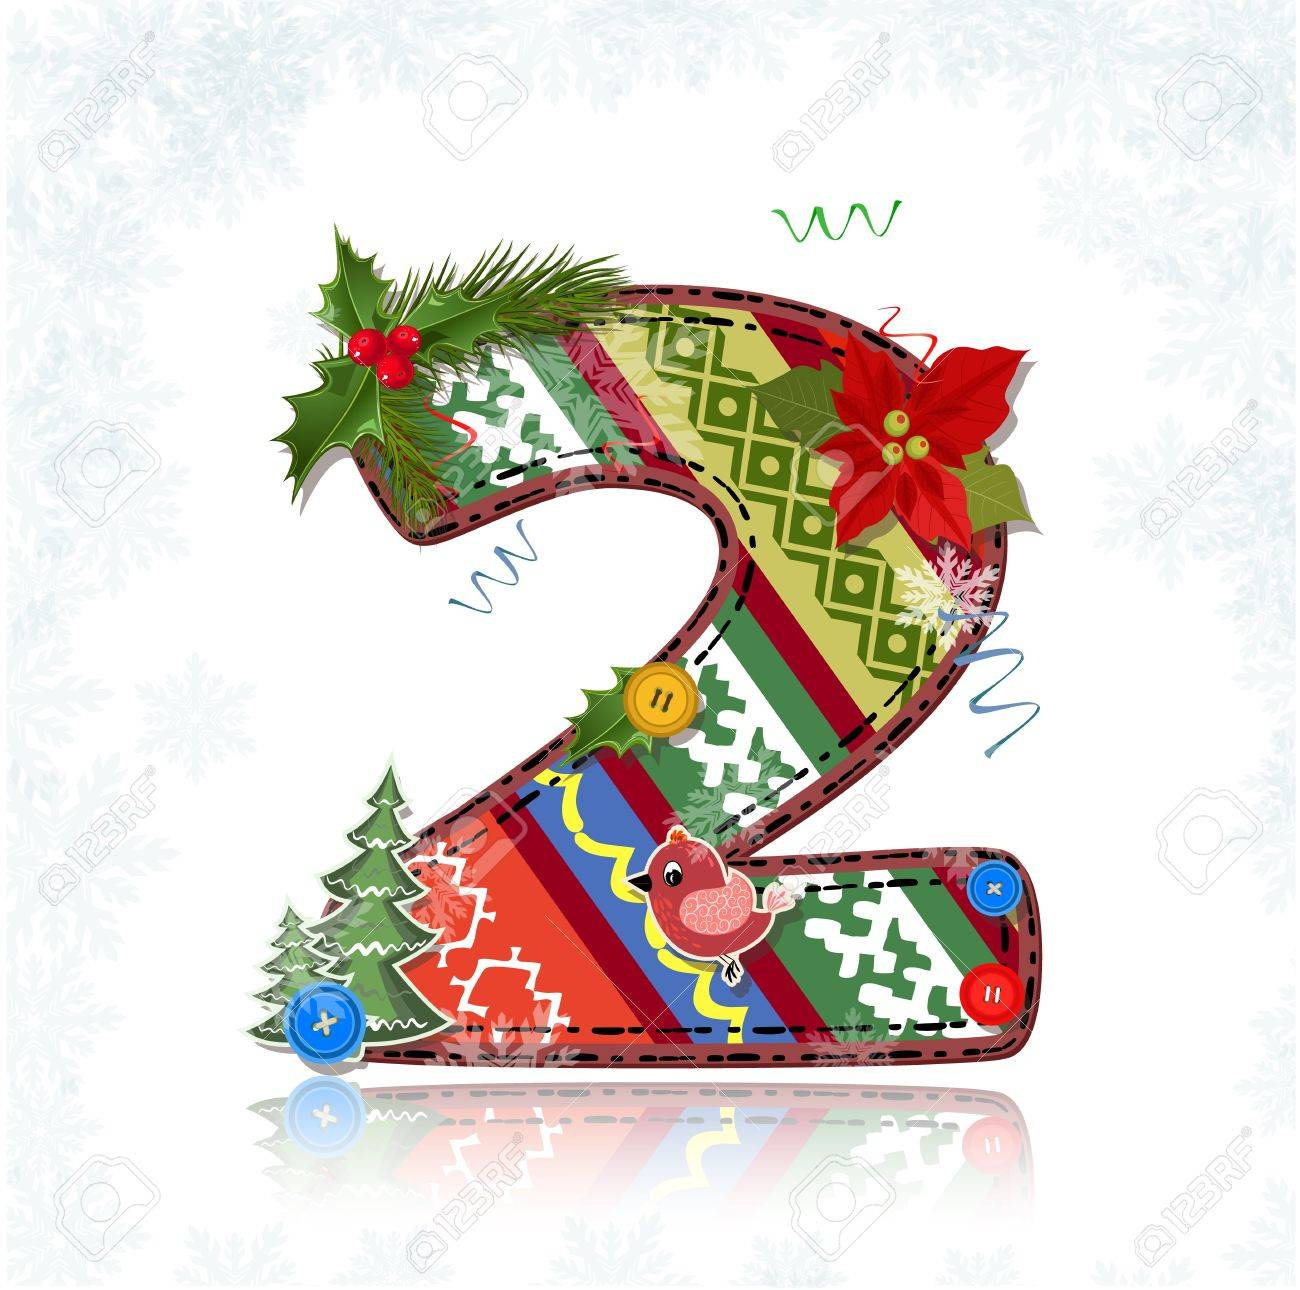 Christmas Alphabet Stock Photos By Rusmediabank At 123 Royalty ...